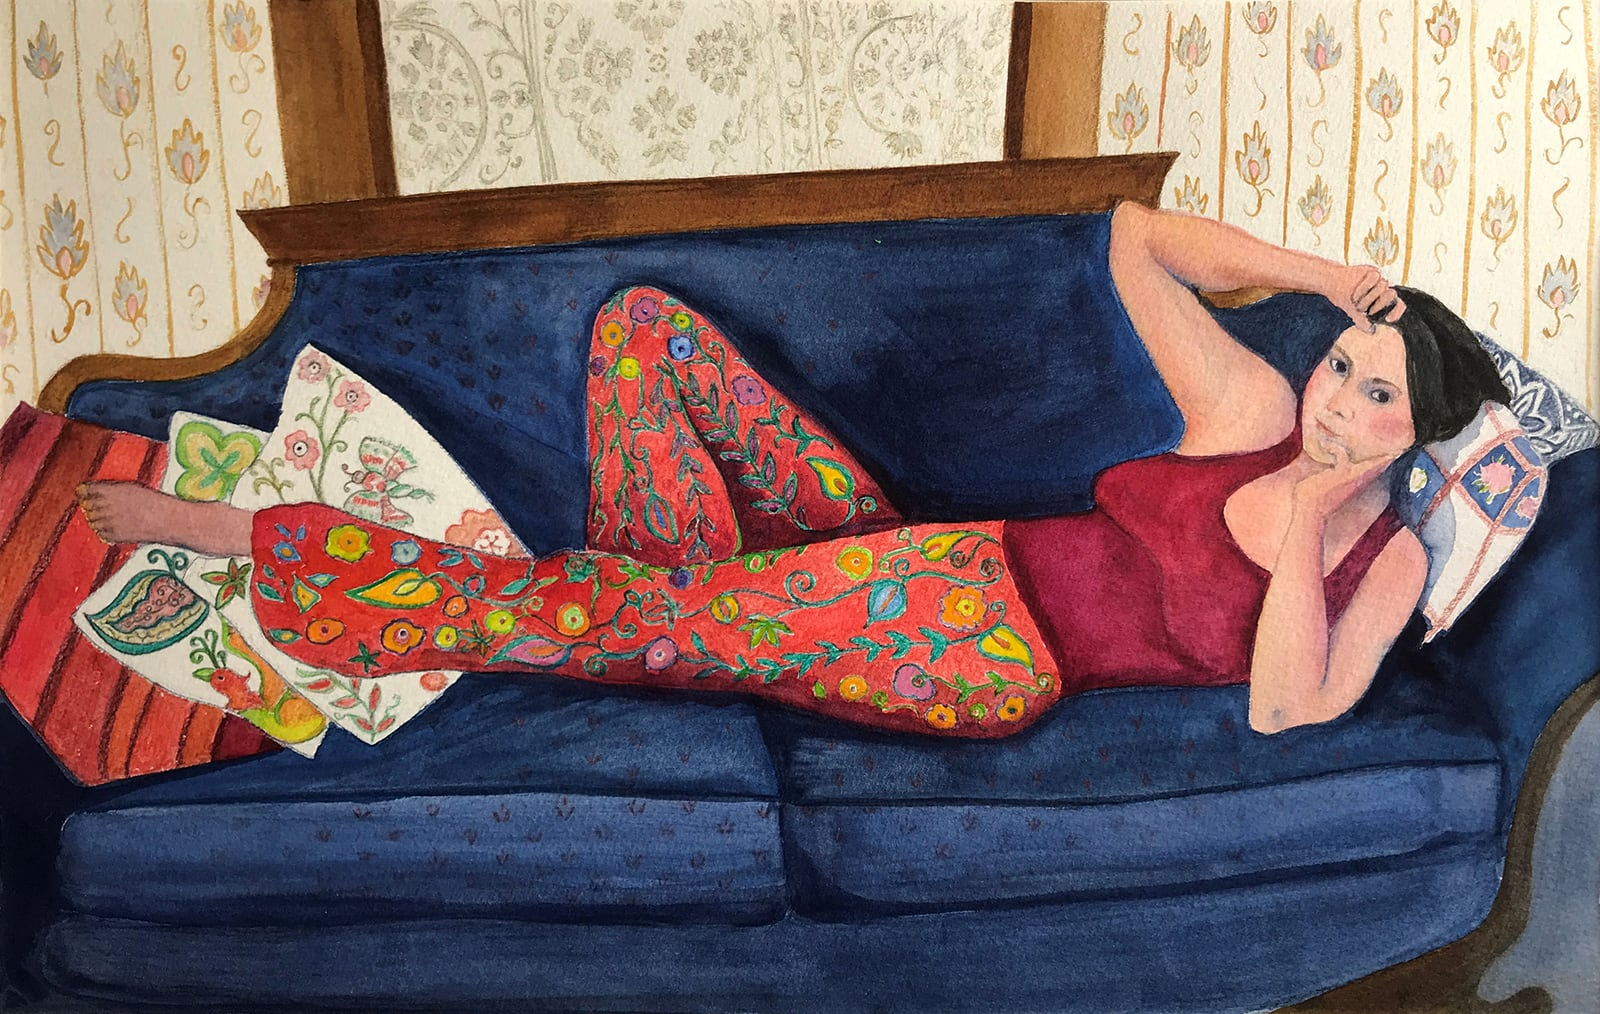 Amy Reclining-Karen Anderson Schwartz